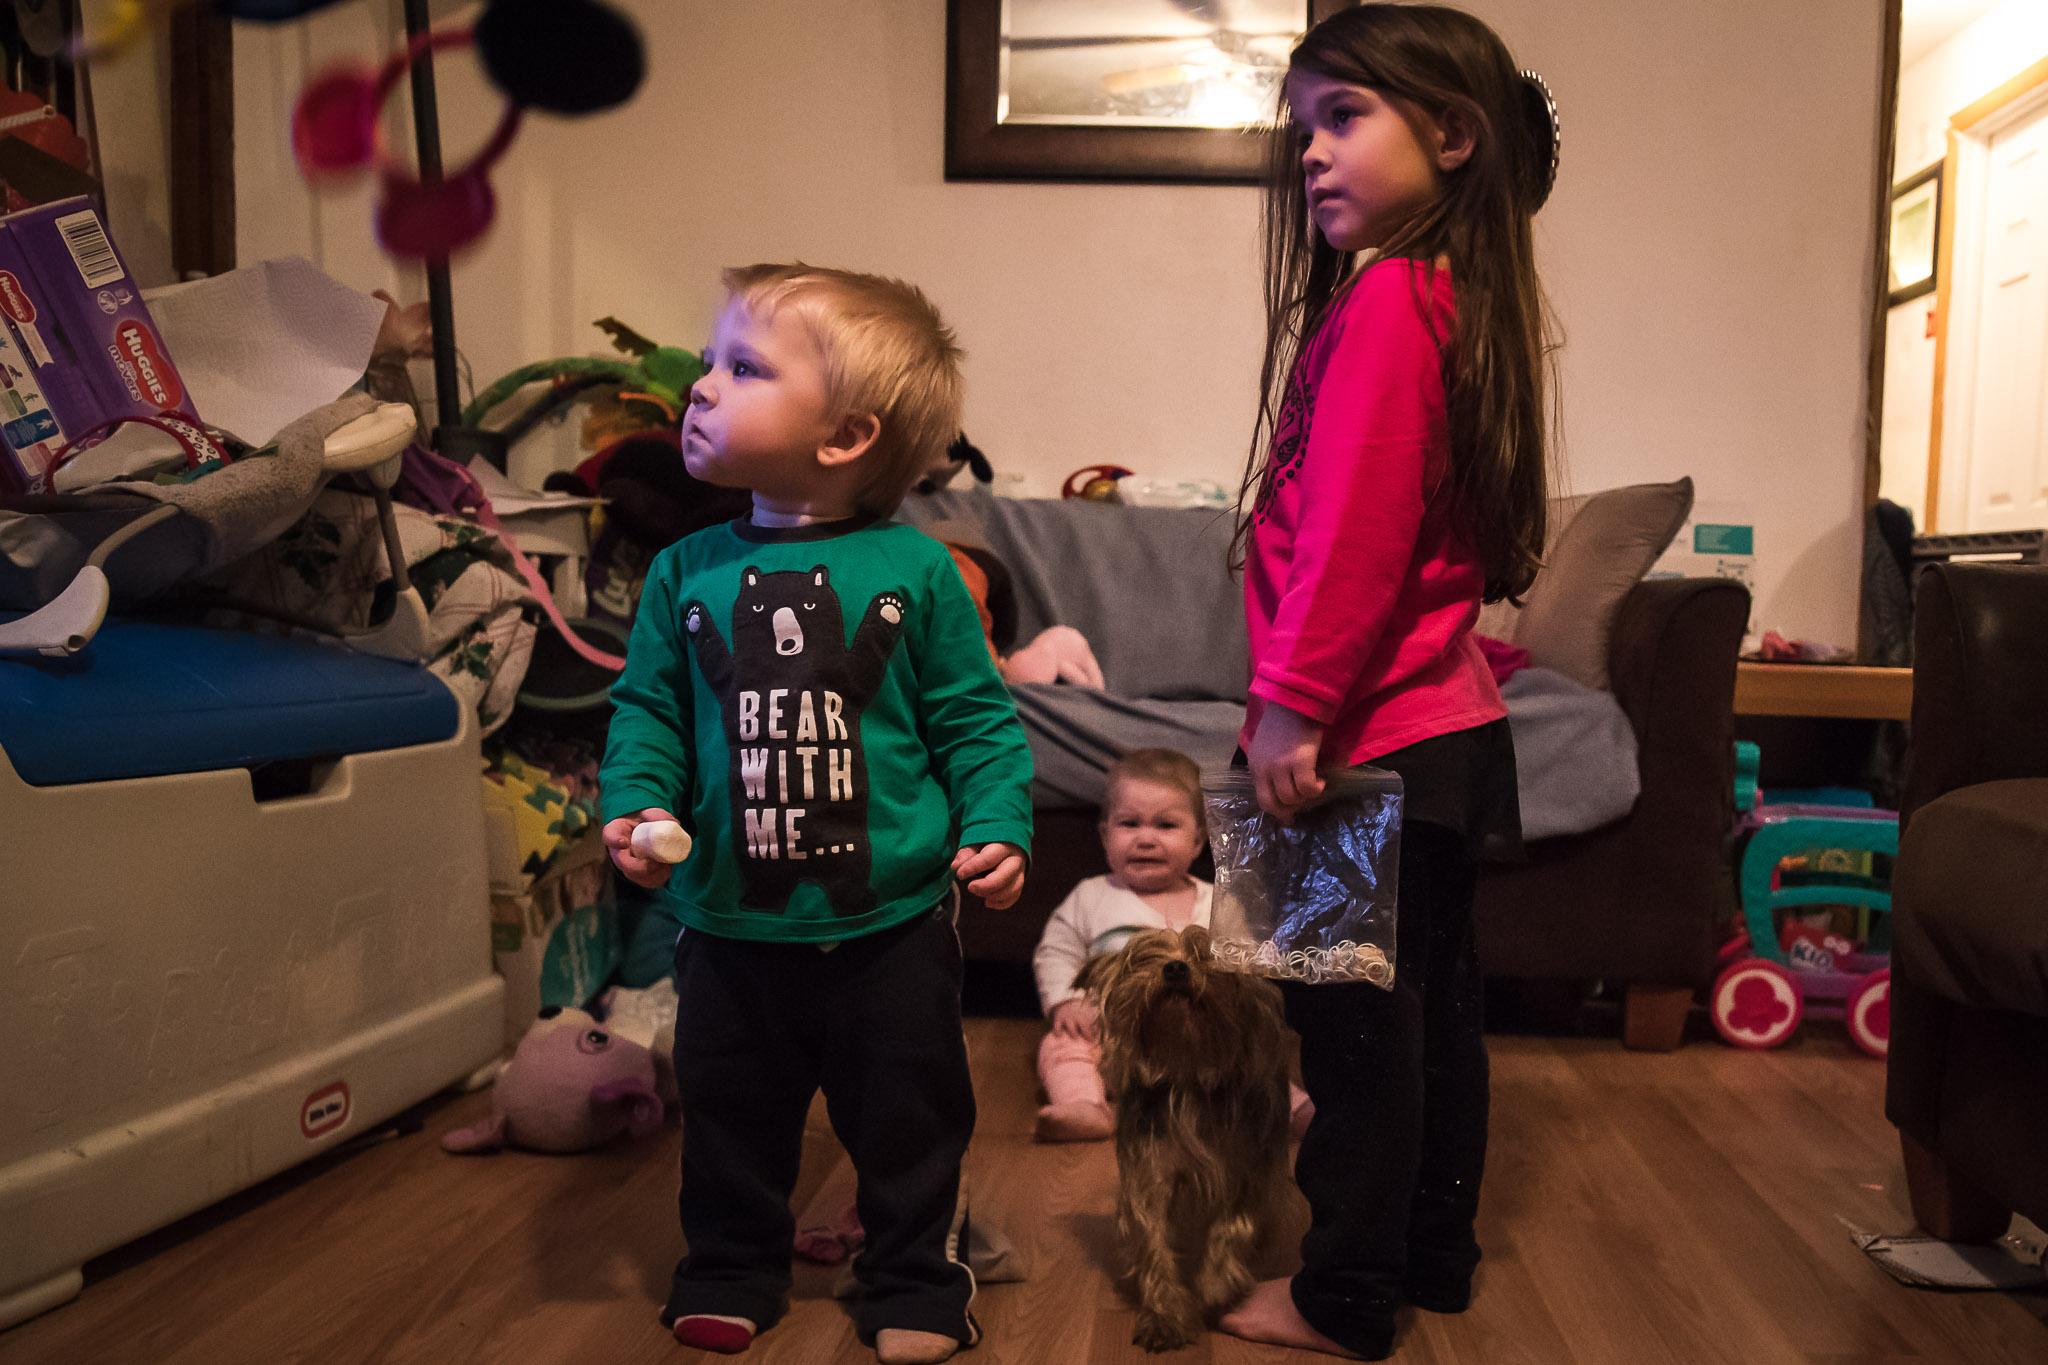 family-photos-friday-evening-real-moments-15.jpg